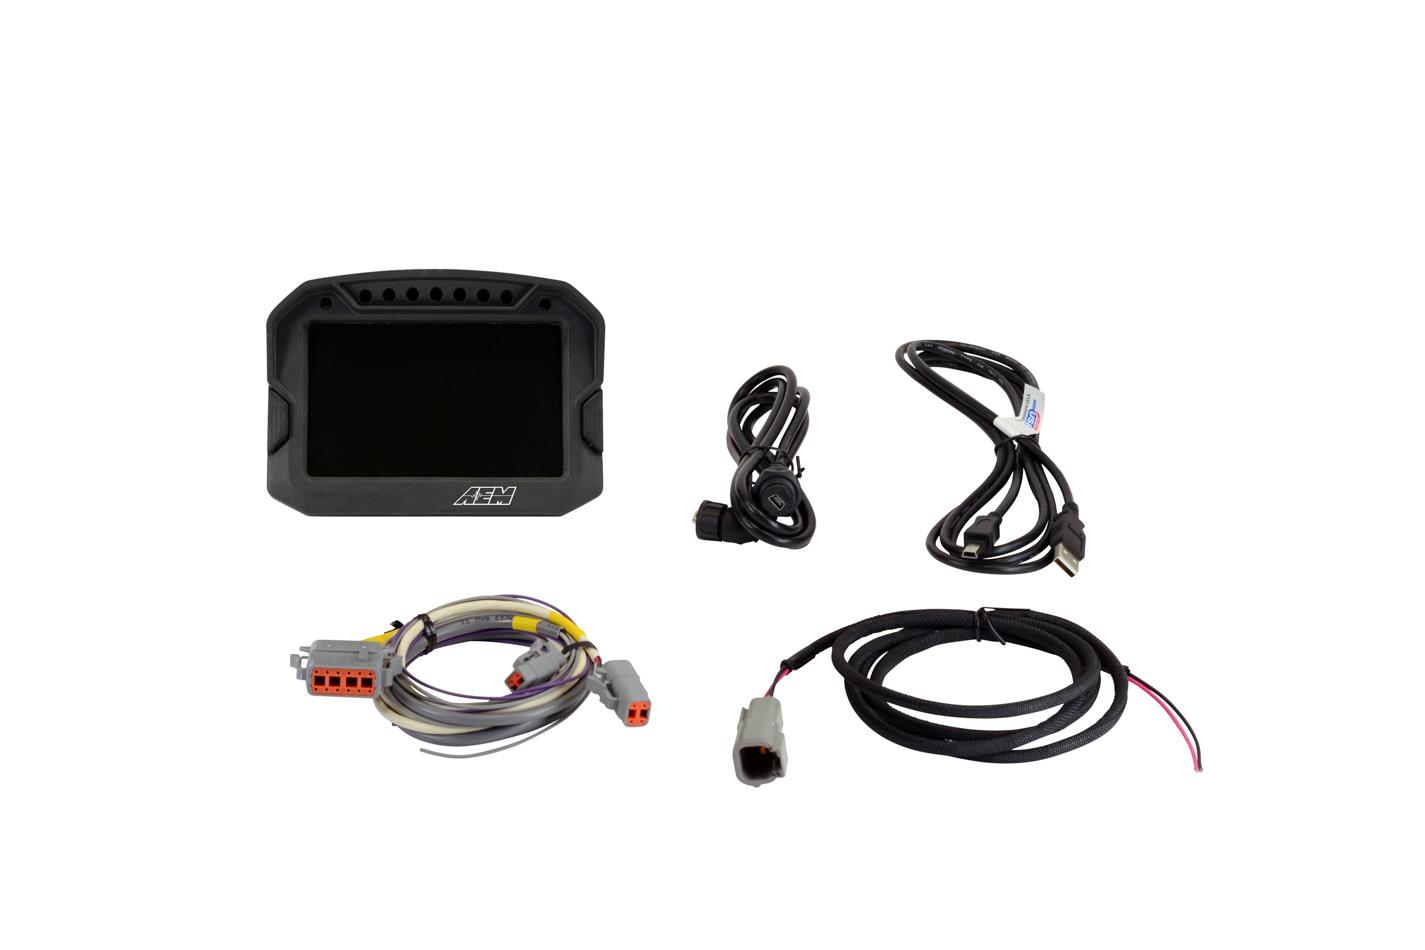 AEM 30-5601 Digital Dash, CD-5L Carbon, DTM Style, Connectors Included, Logging Display, Black, Each